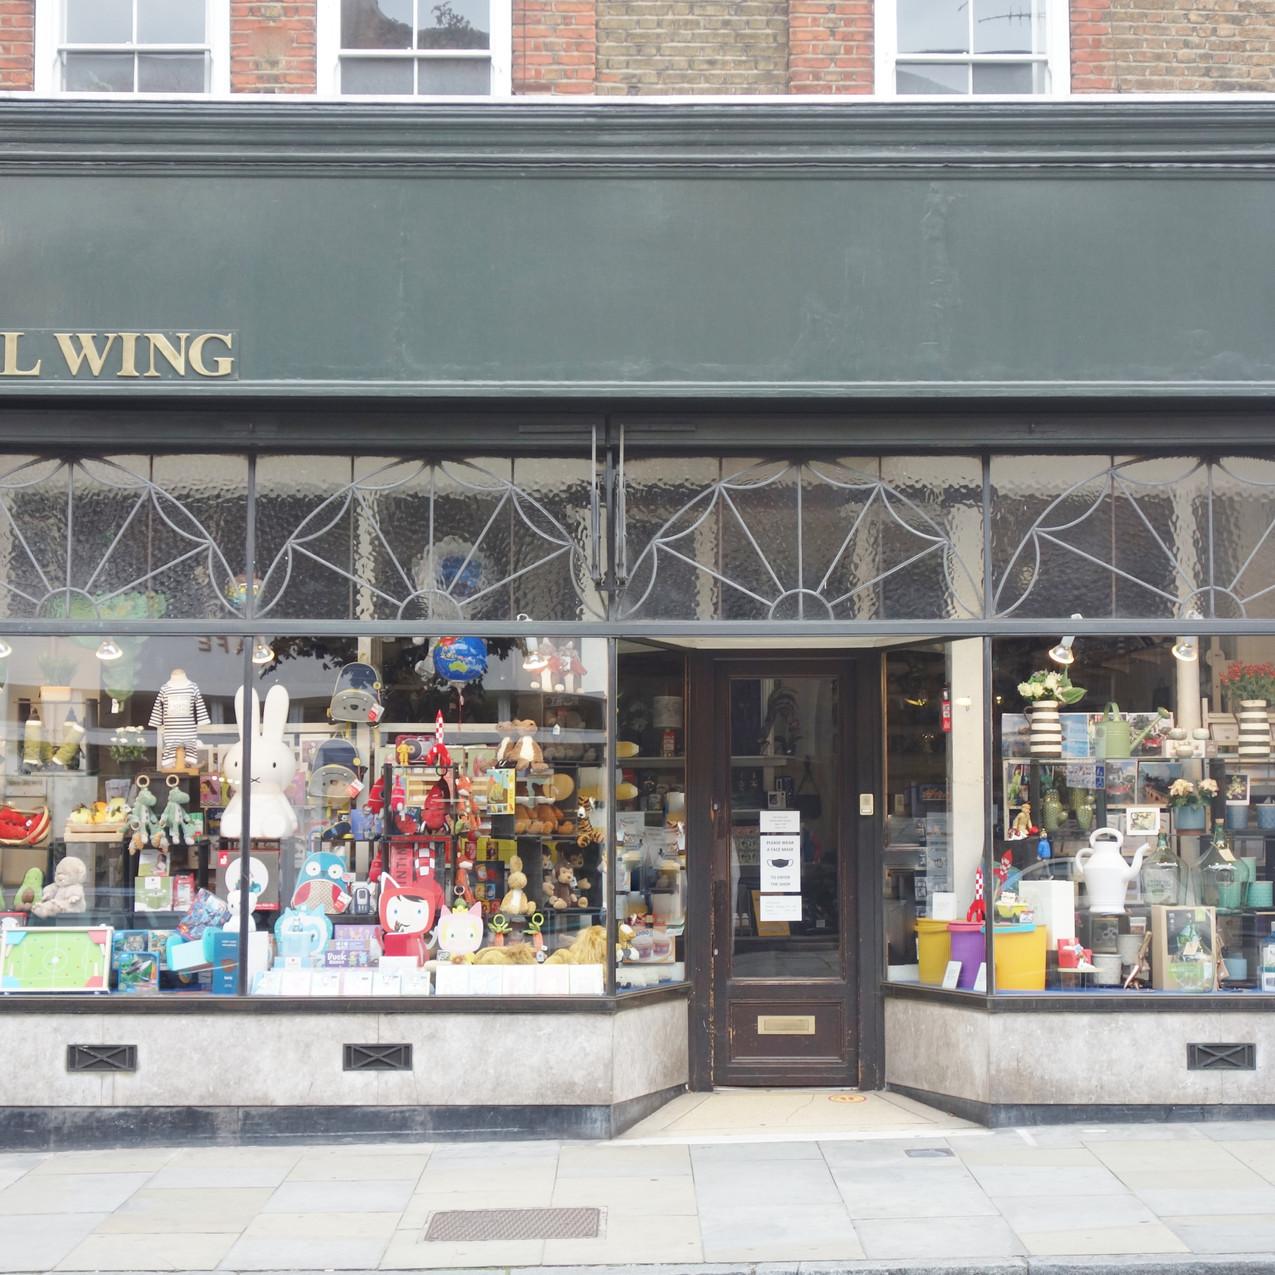 Upper Street, Islington